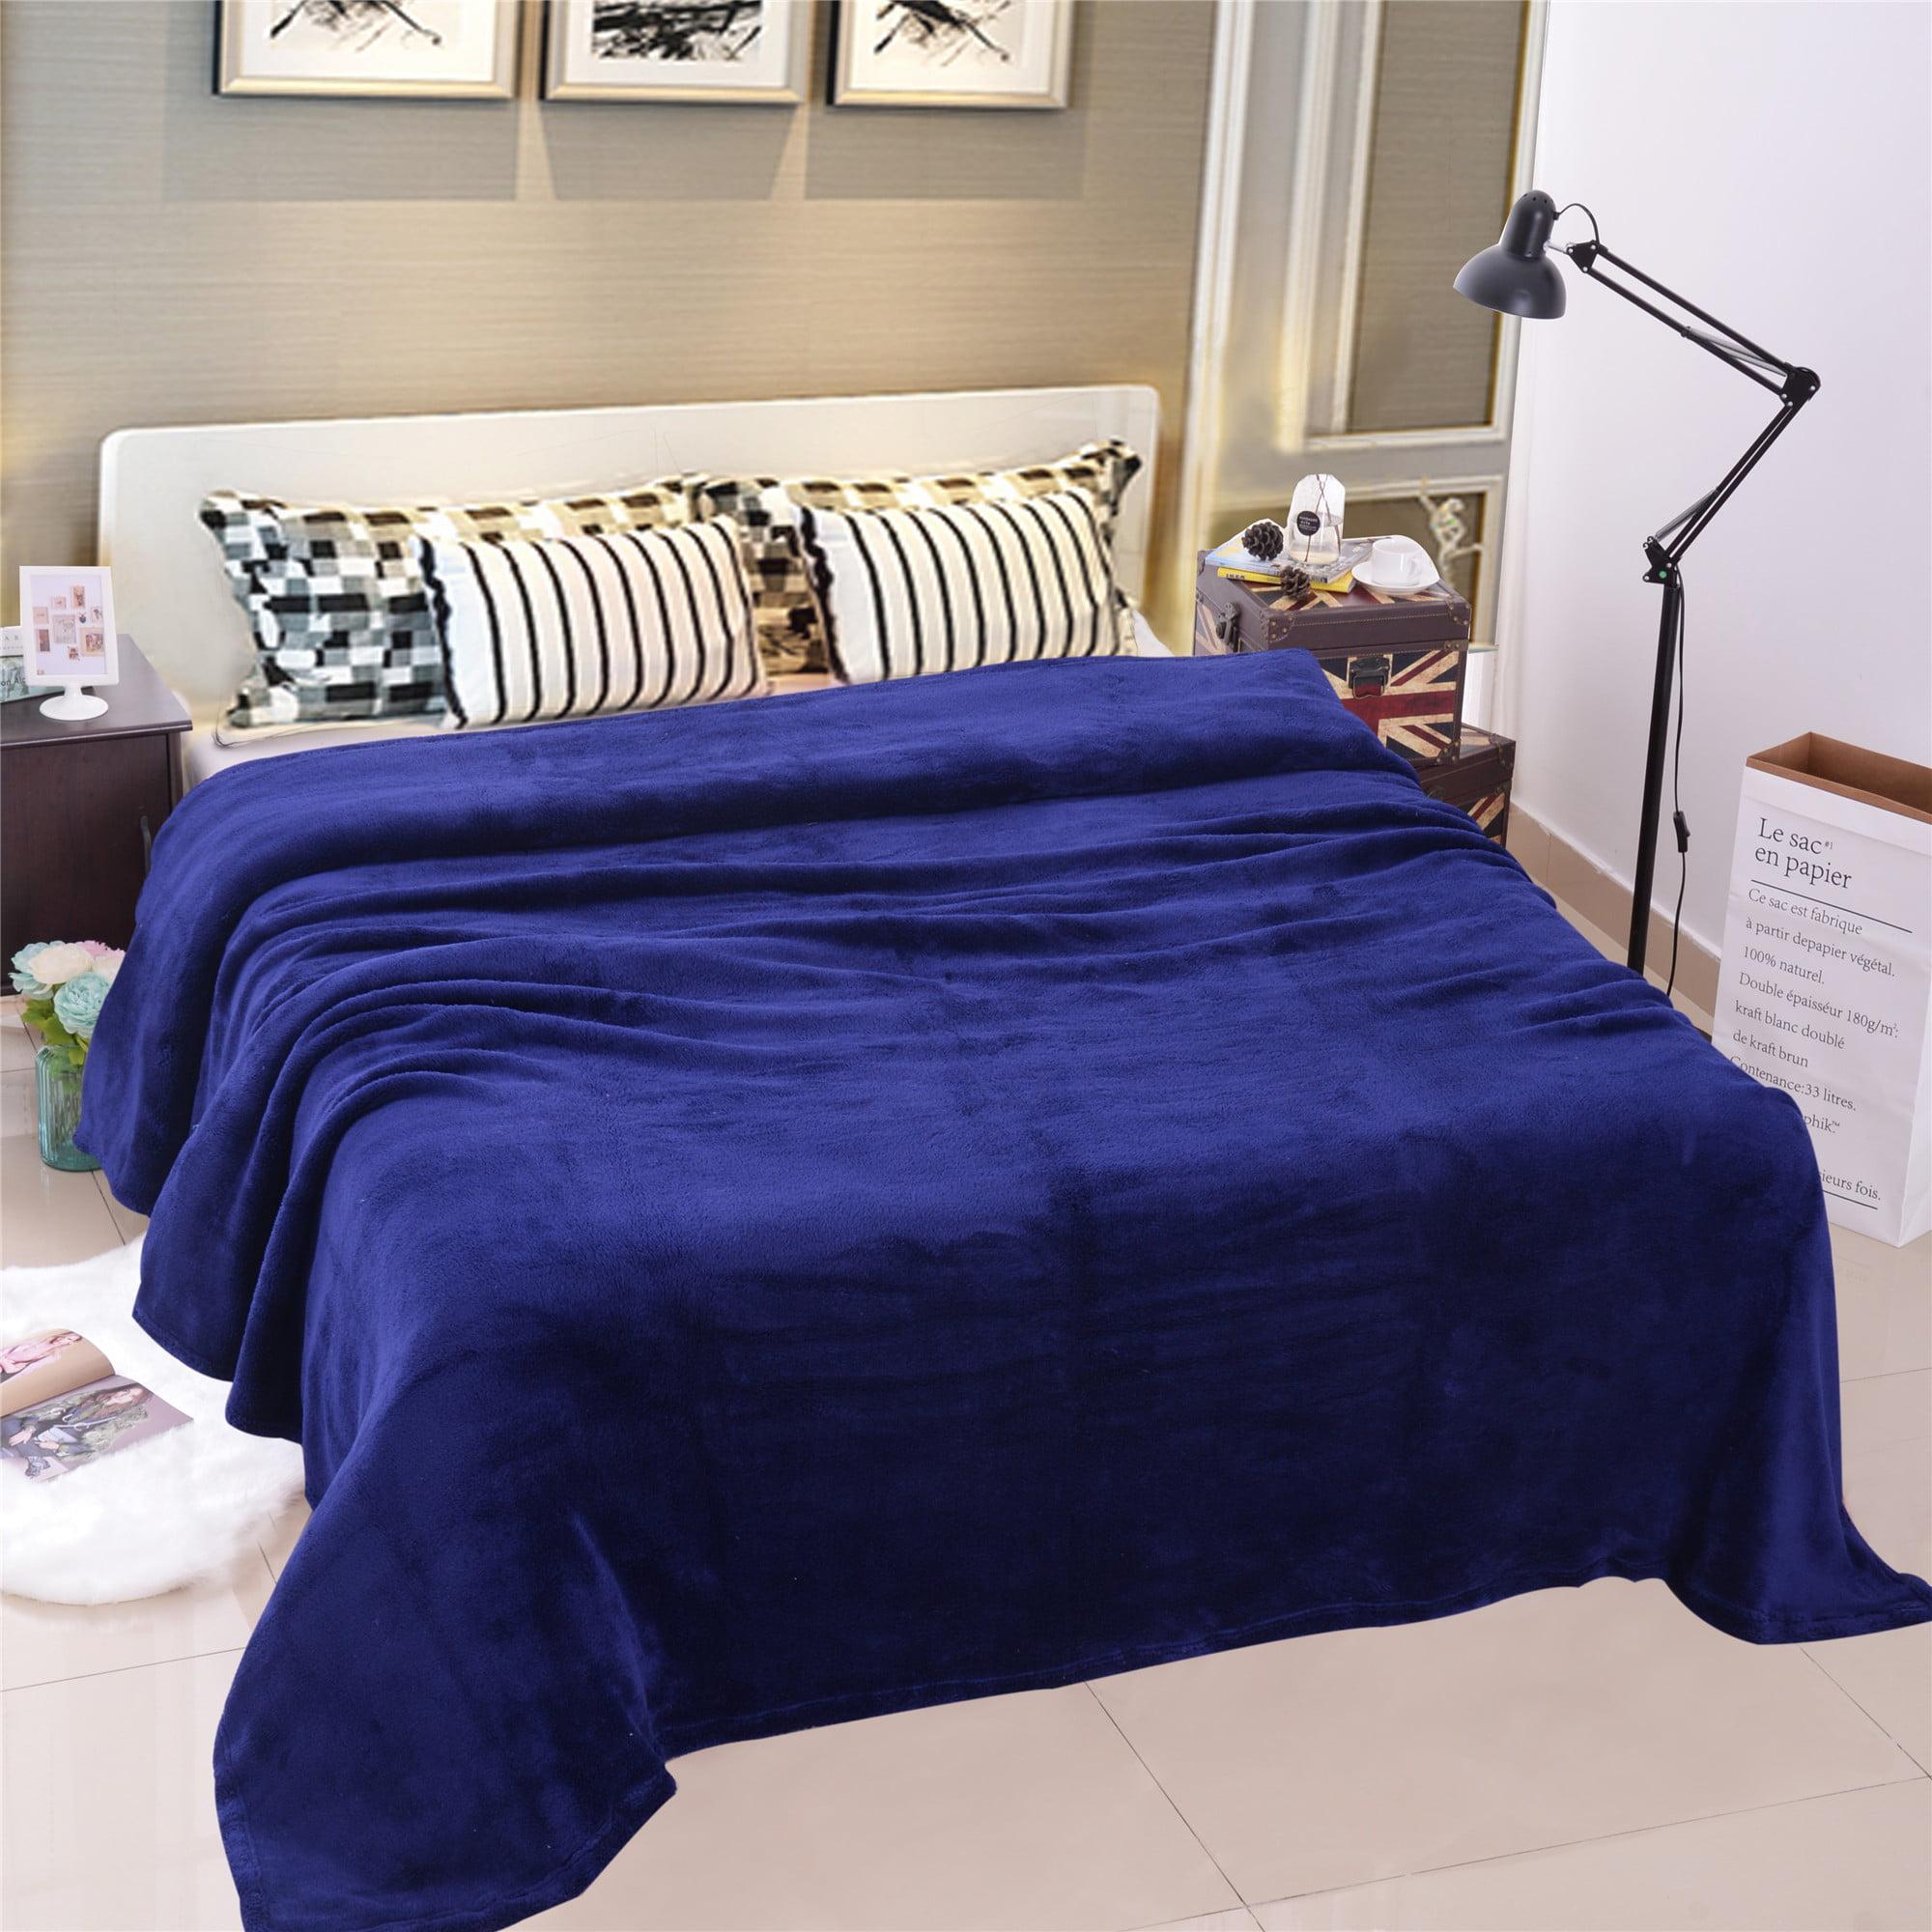 Home Bedroom Microfiber Plush Fleece Blanket Large Solid Lightweight Warm Throw Blanket... by JML